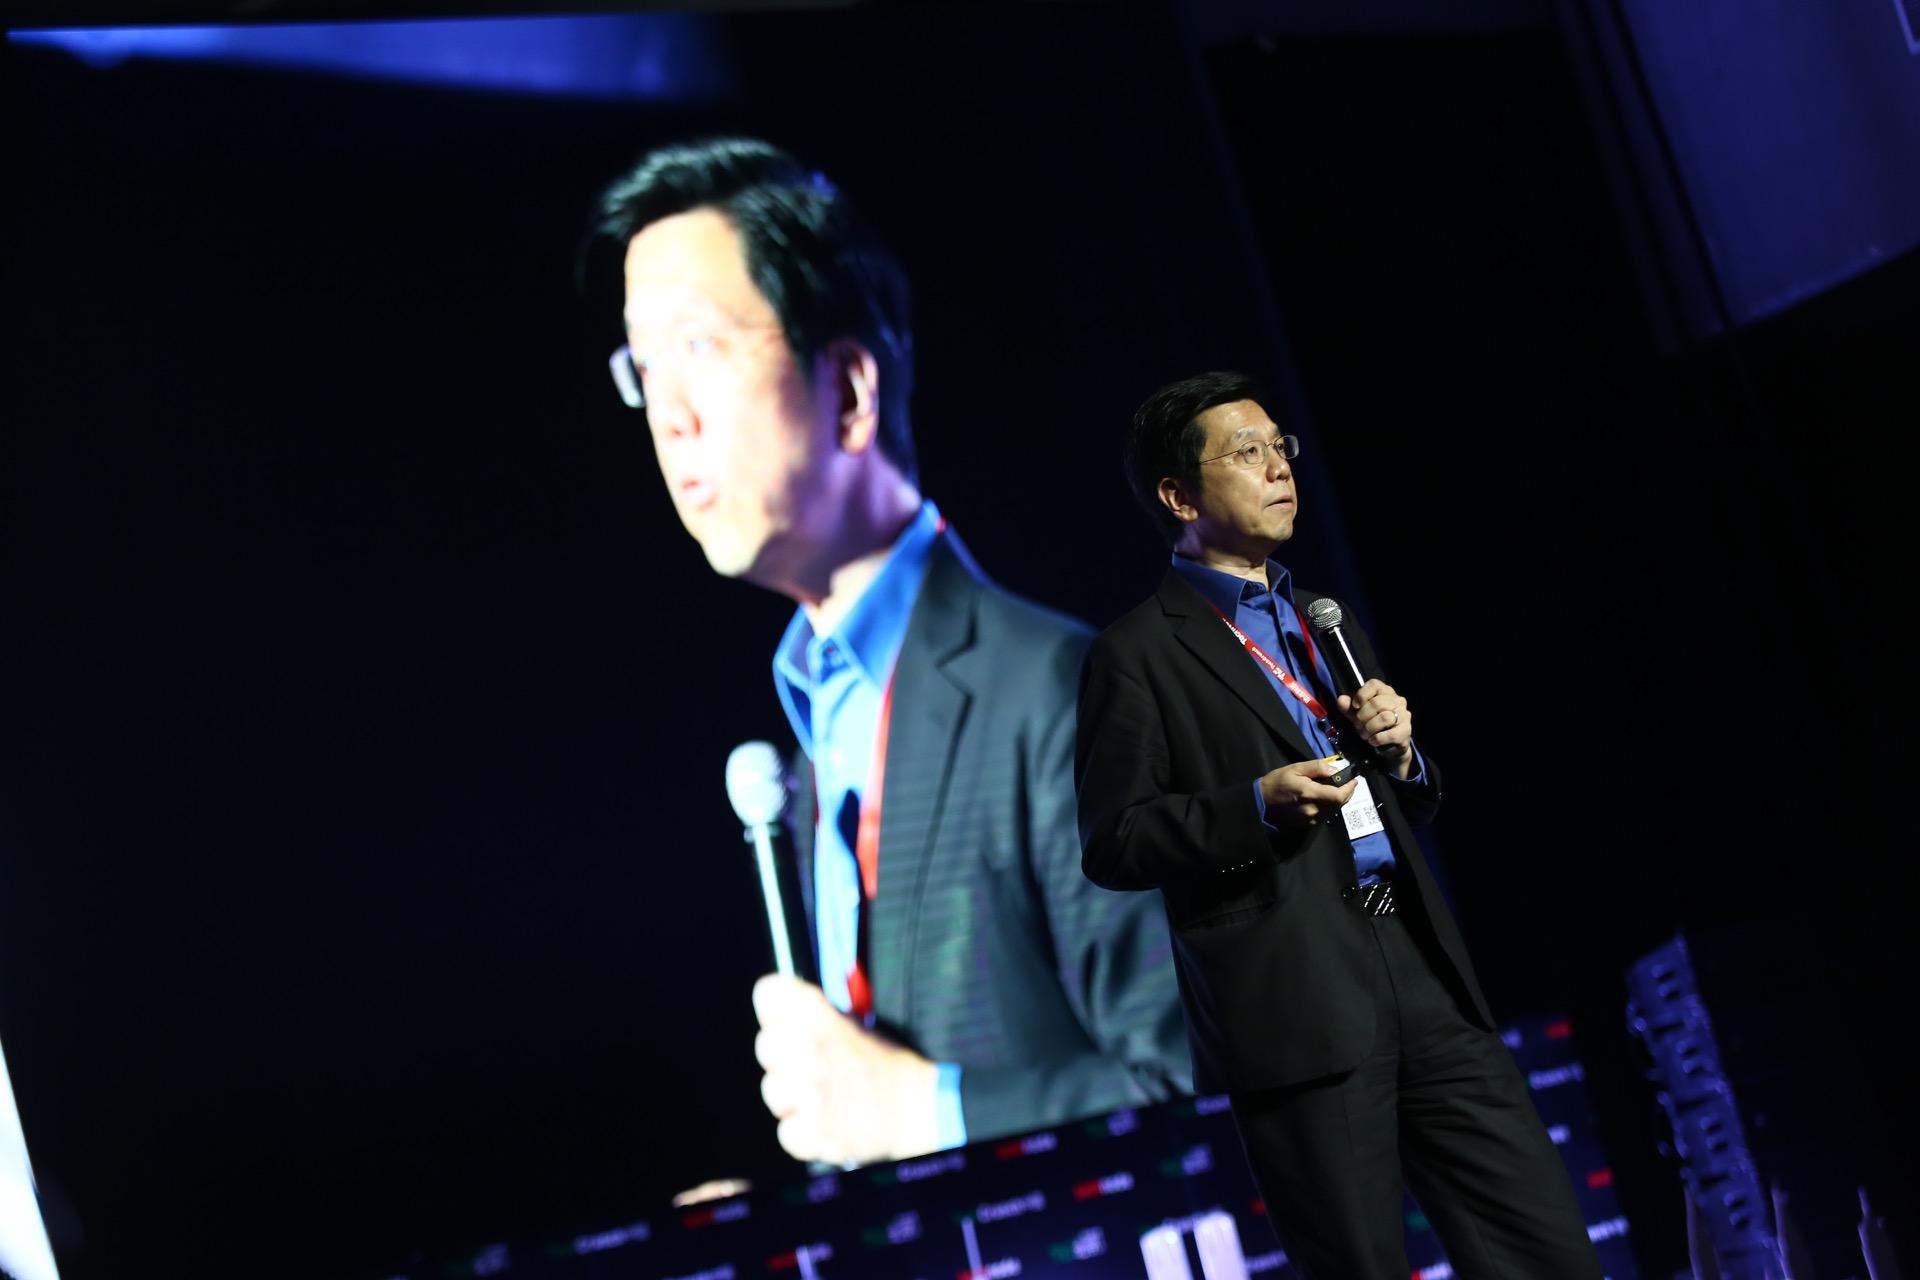 Kaifu Lee at 2016 TechCrunch Conference